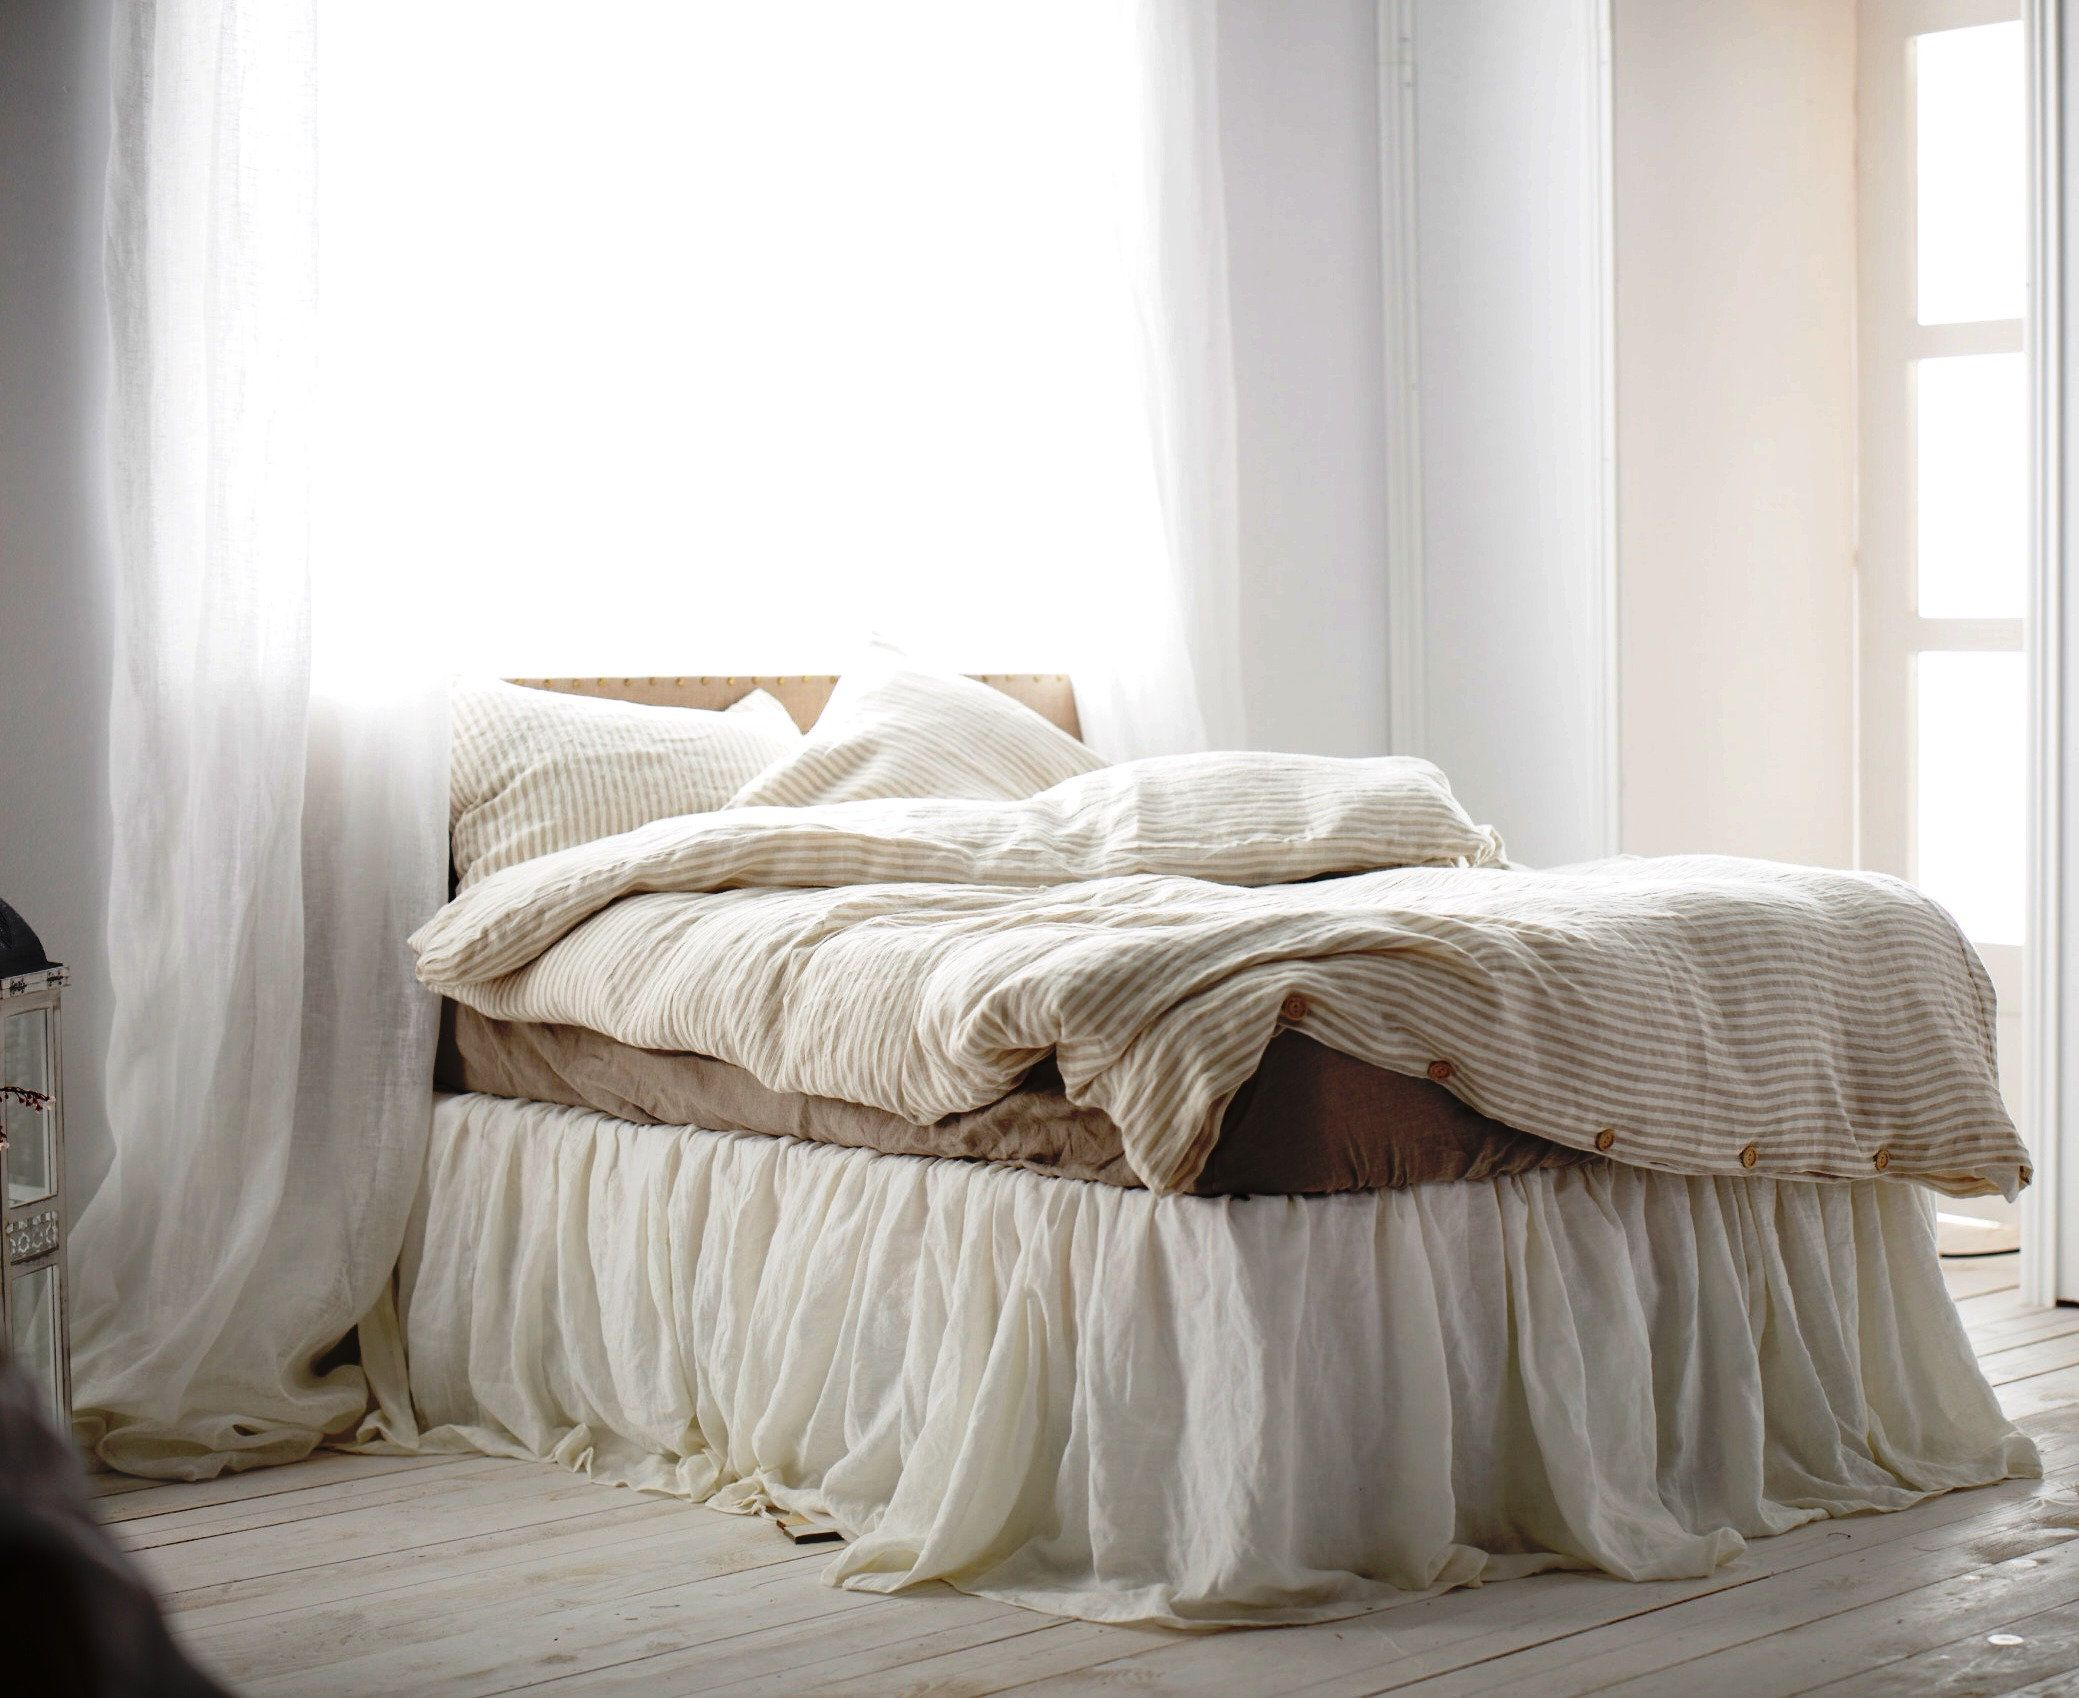 Linen Bed Skirt Ruffled Bedskirt Queen Size Linen Bedding Handmade Bedskirt Choose The Drop Morning Sun Idee Letto Biancheria Da Letto Con Volant Lenzuola